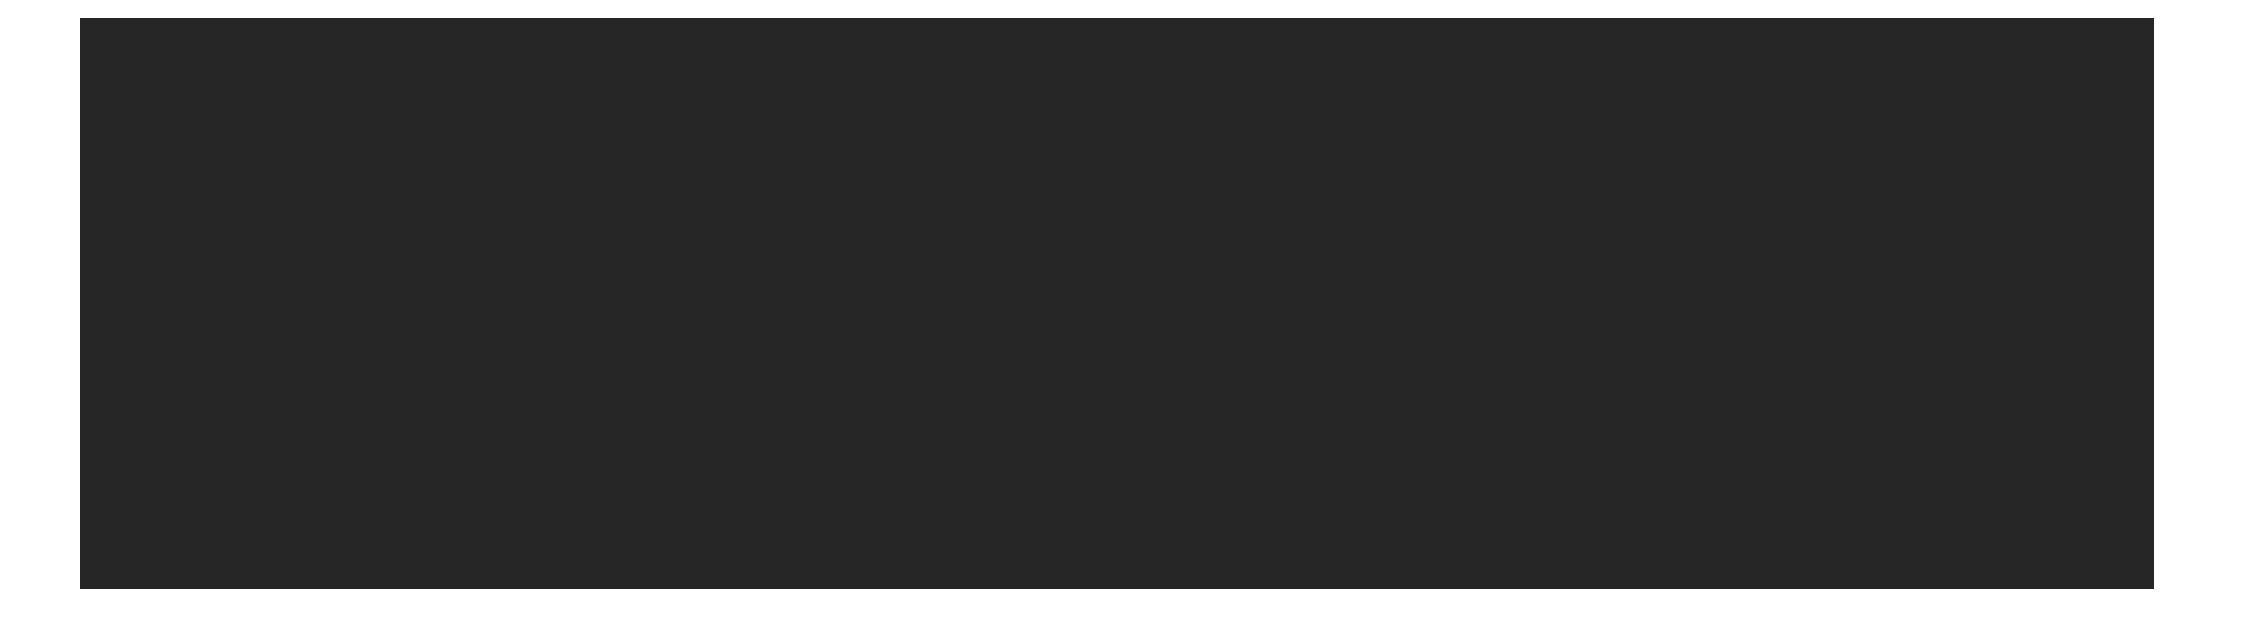 all rise logo